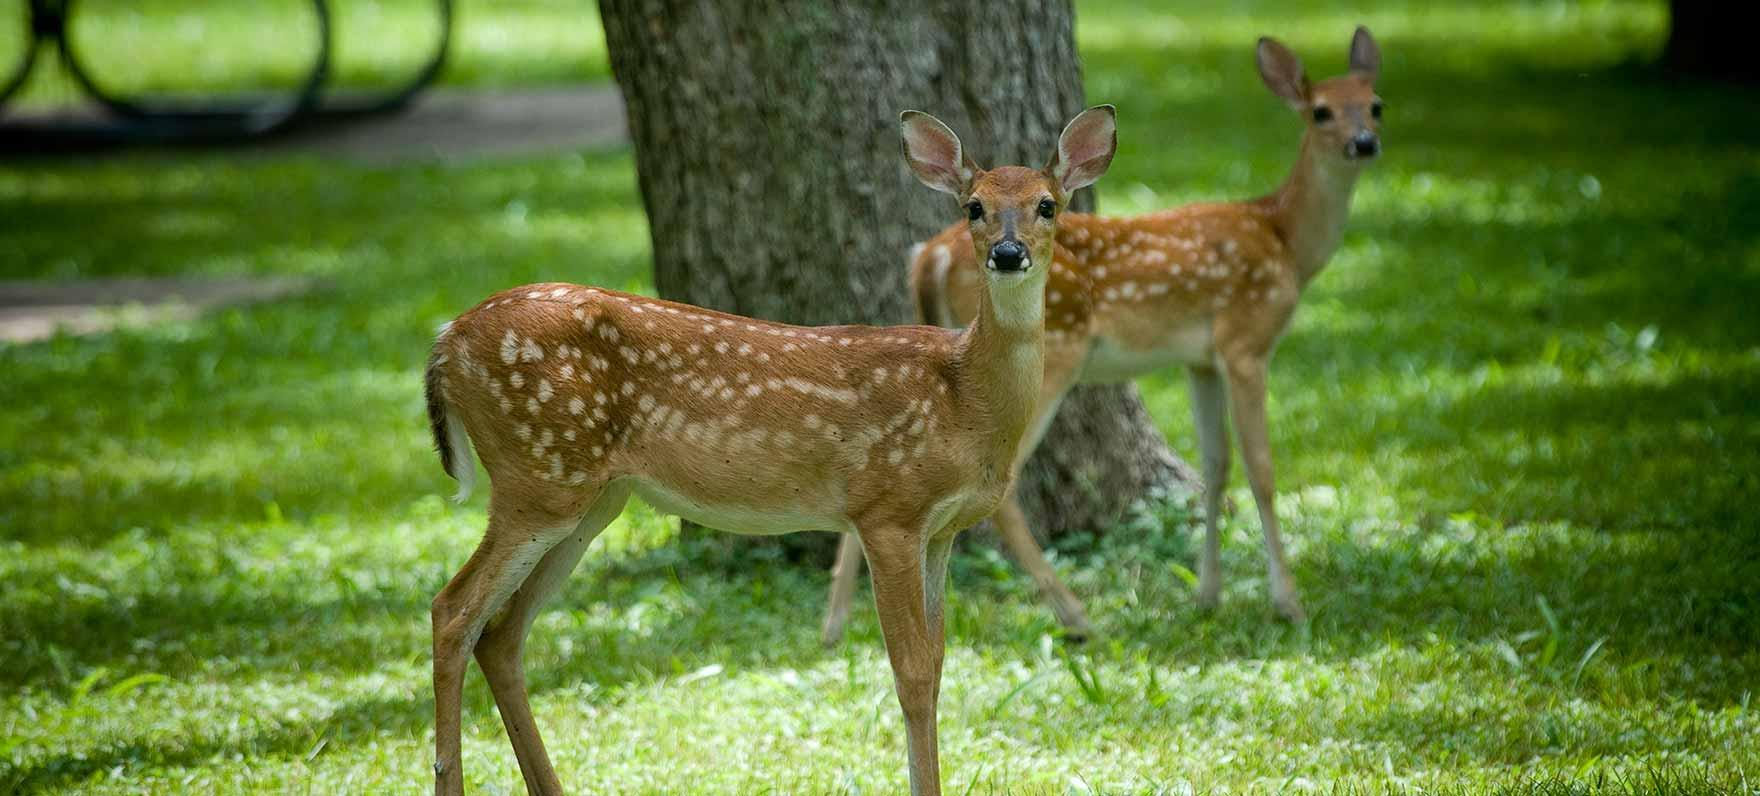 stephen f  austin state park  u2014 texas parks  u0026 wildlife